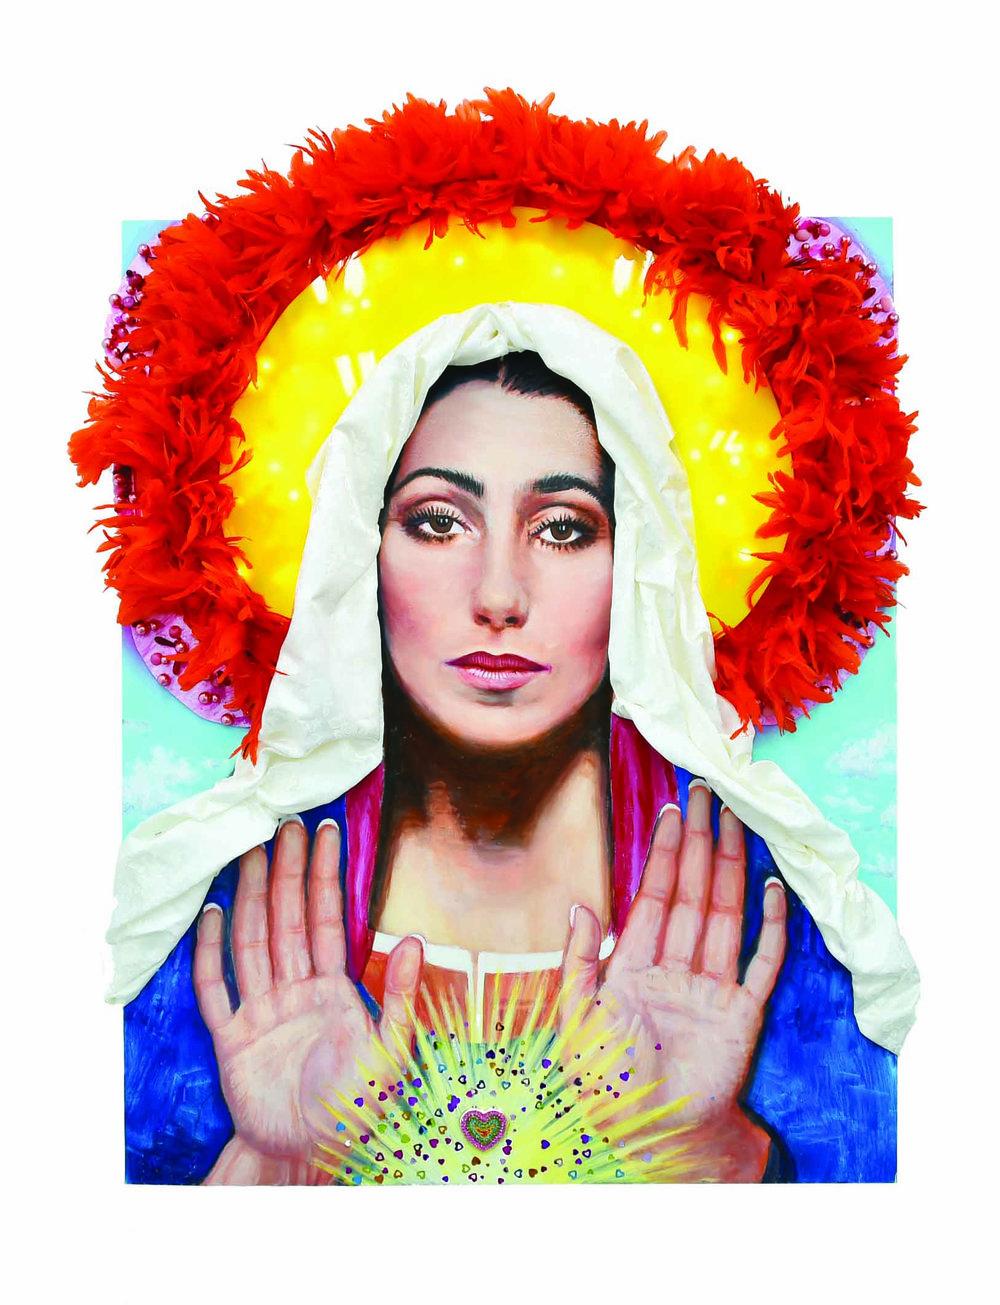 StrosbergMandel-Cher-Acrylic_frame-16 x 20 in.-$1,500.jpg